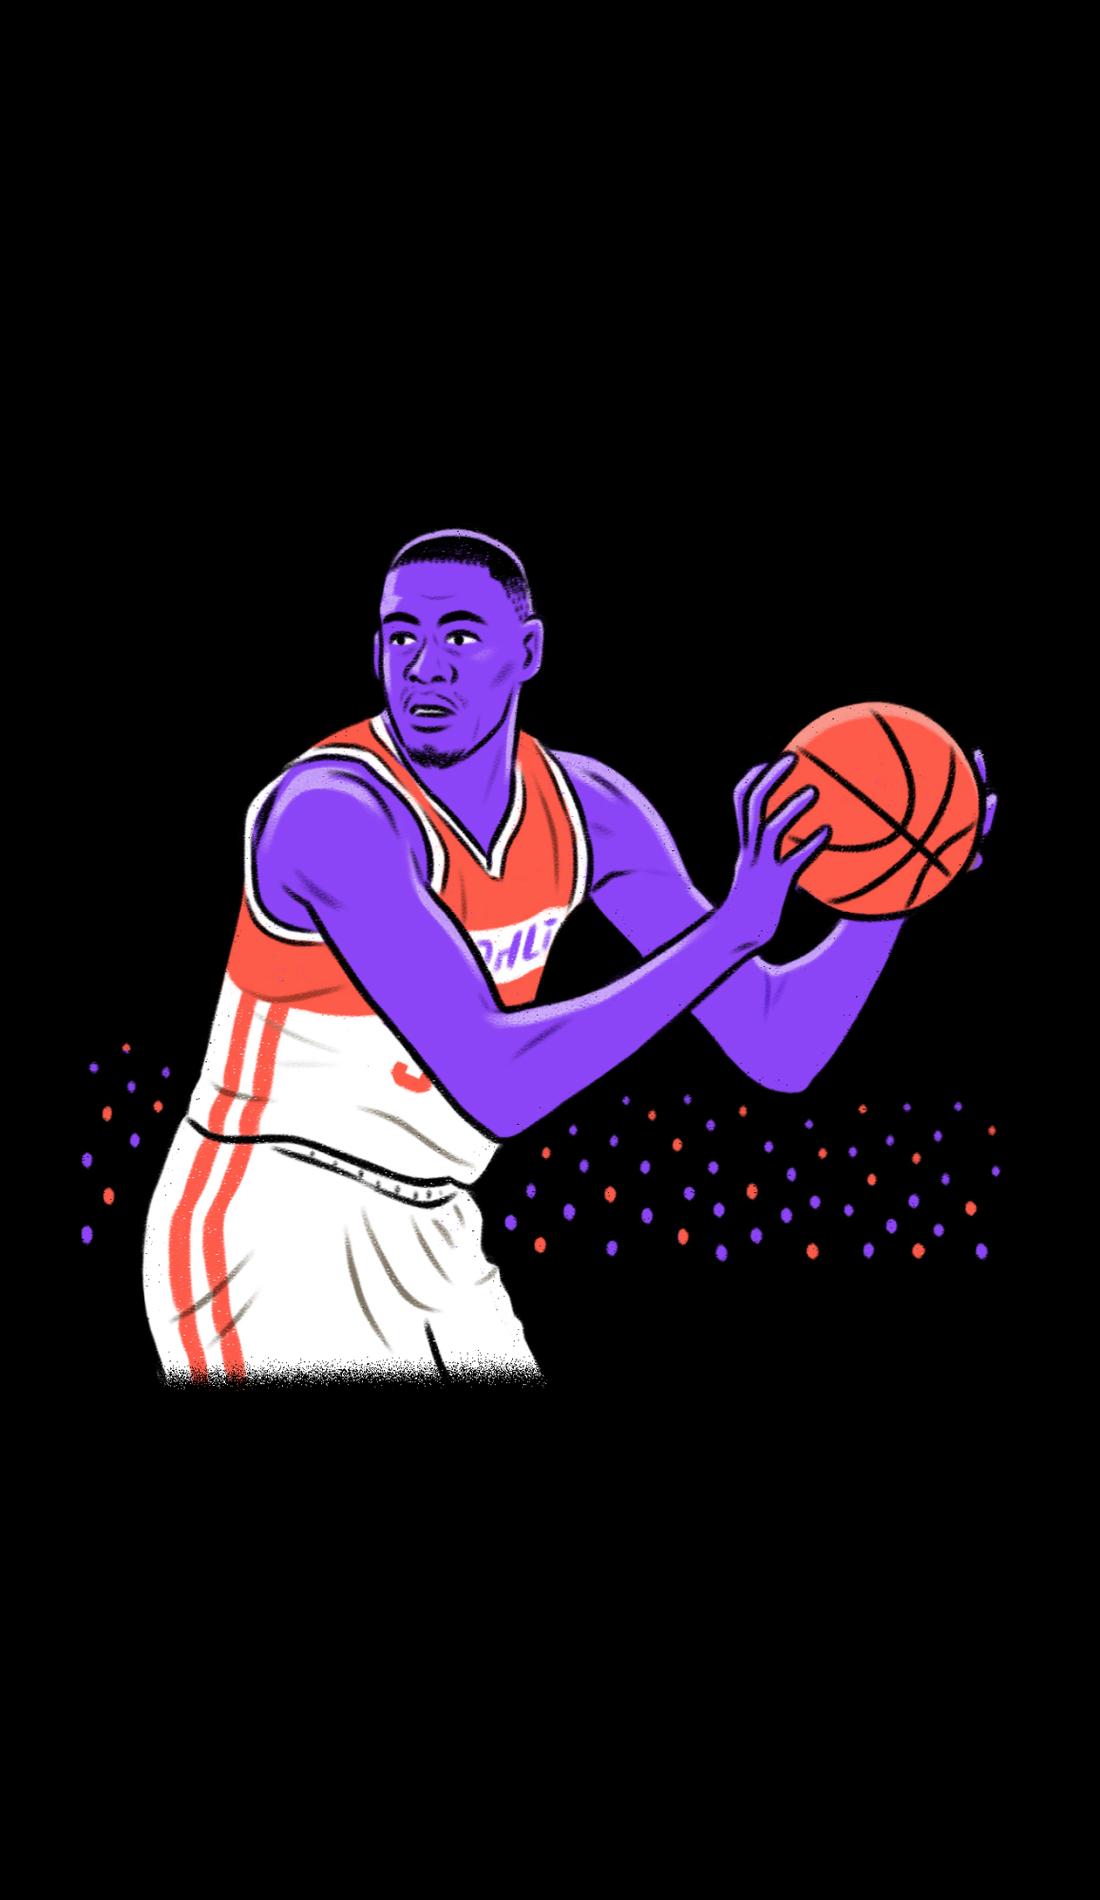 A Arkansas Razorbacks Basketball live event